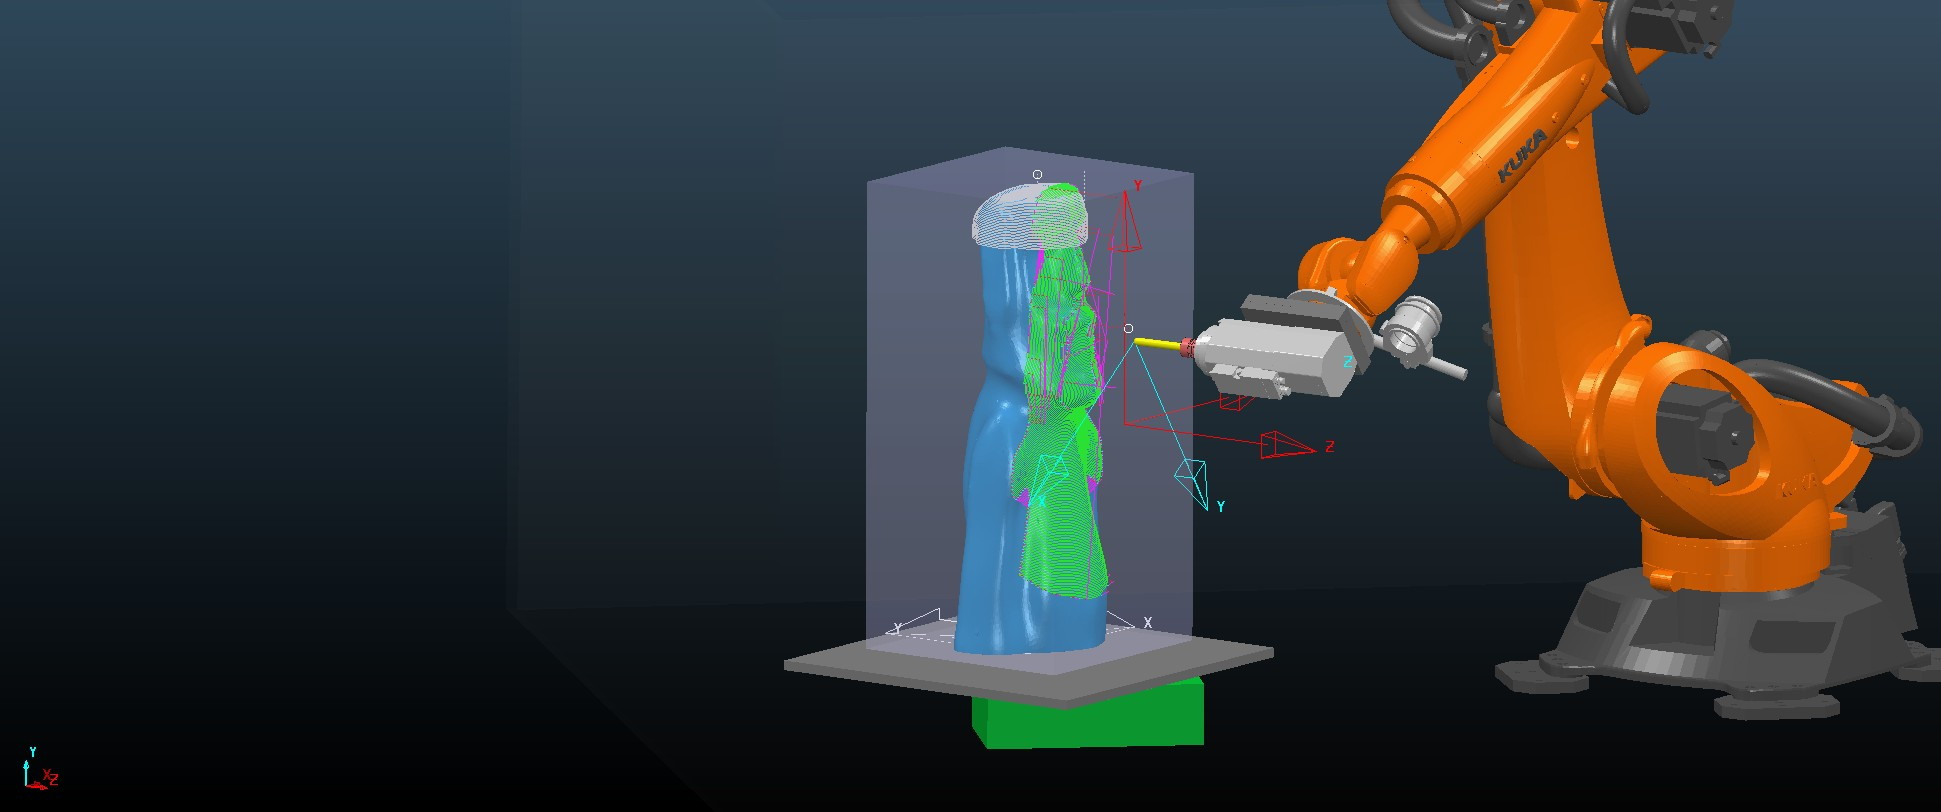 CNC simulation